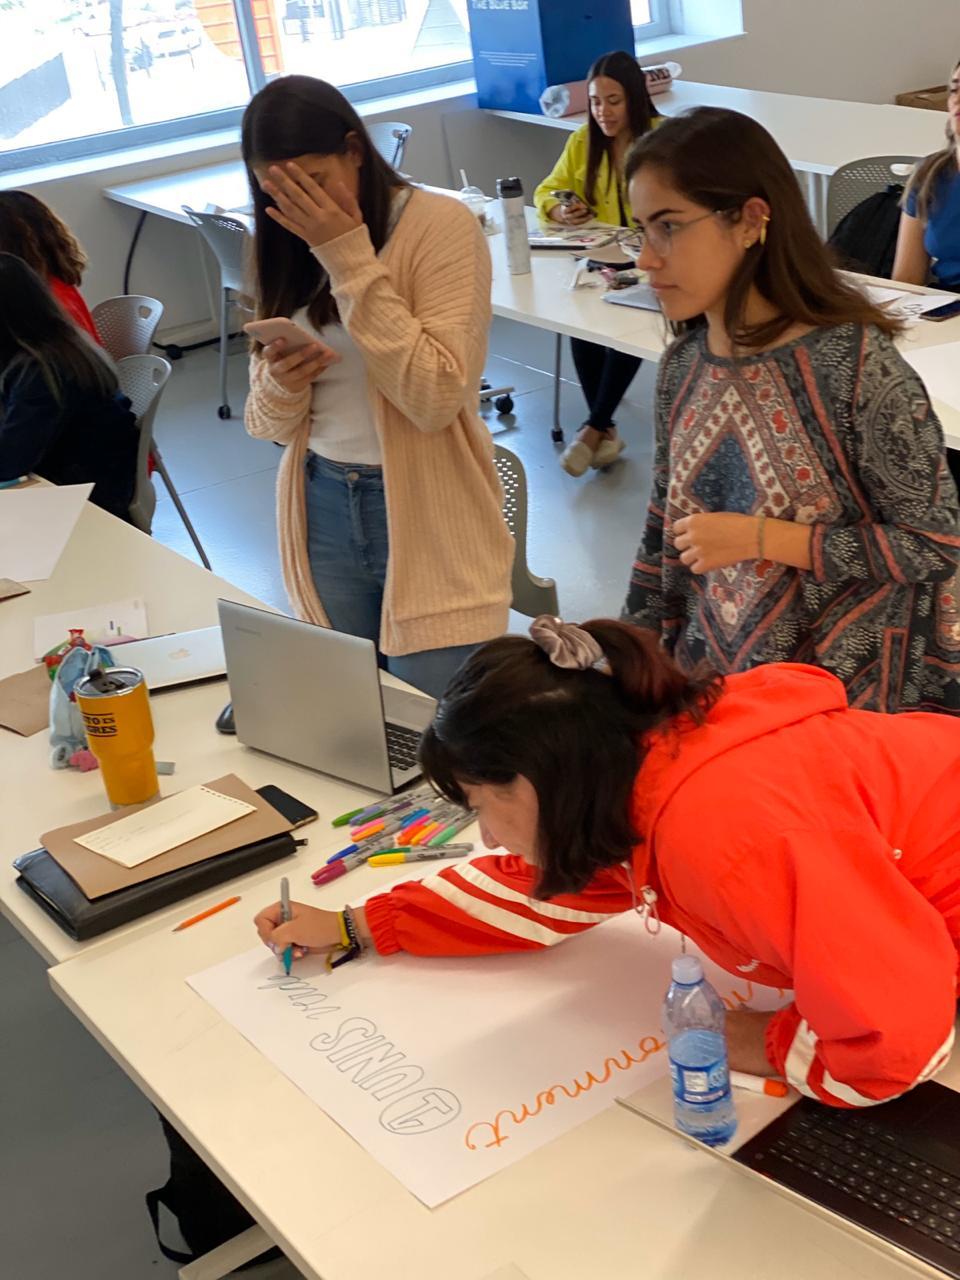 jorge-diego-etienne-trend-workshop-udem-5.jpeg